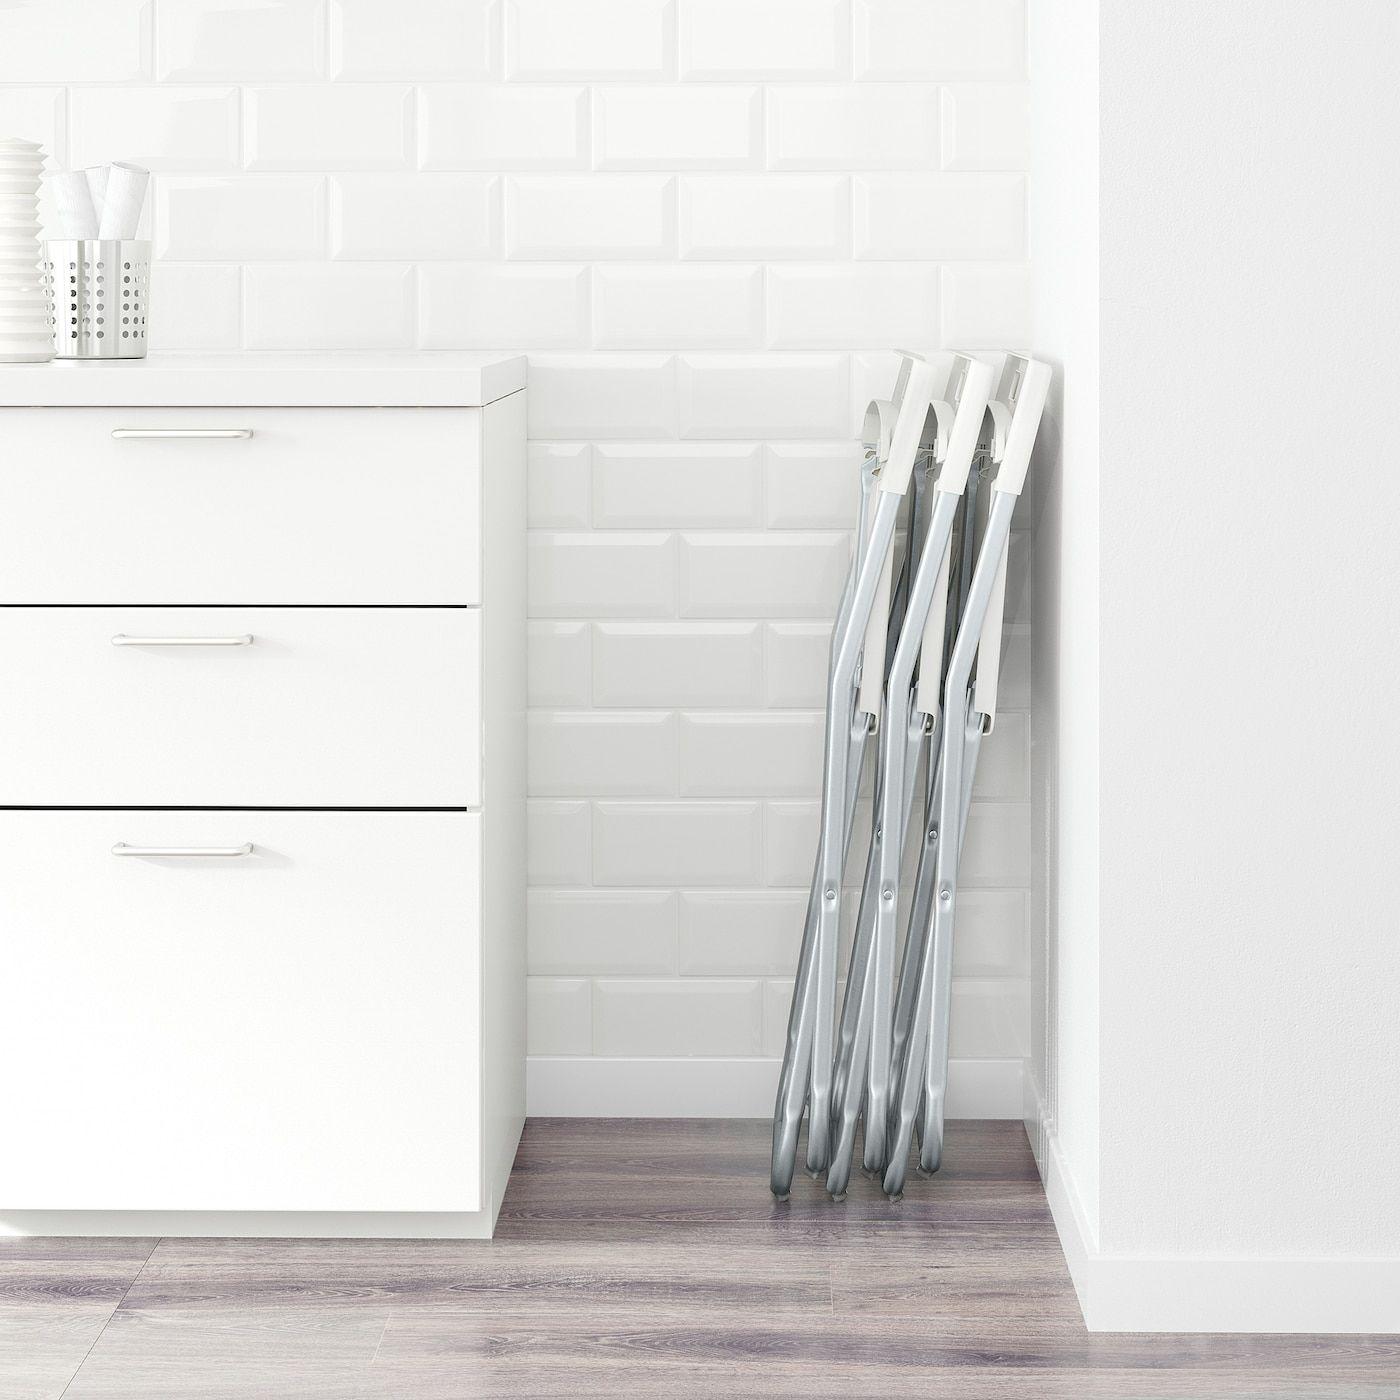 Gunde Folding Chair White In 2020 Folding Chair Cheap Folding